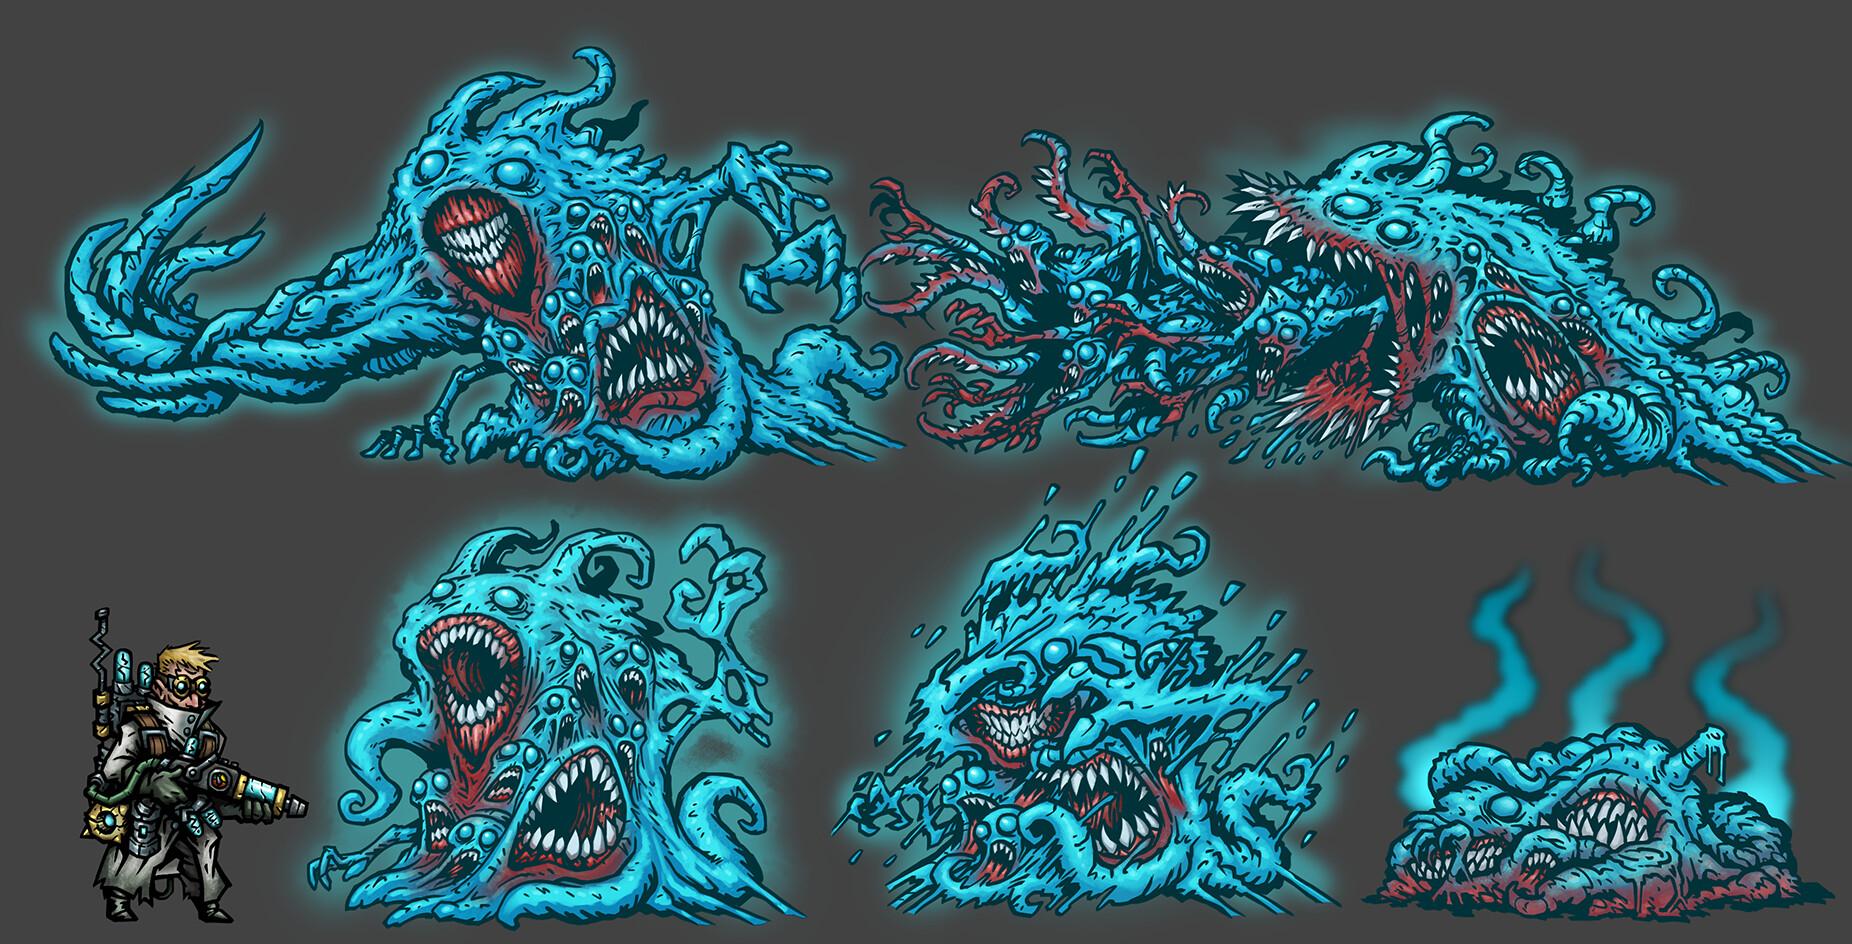 Artstation Beyond Mortality Darkest Dungeon Mod Concept John Yakimow